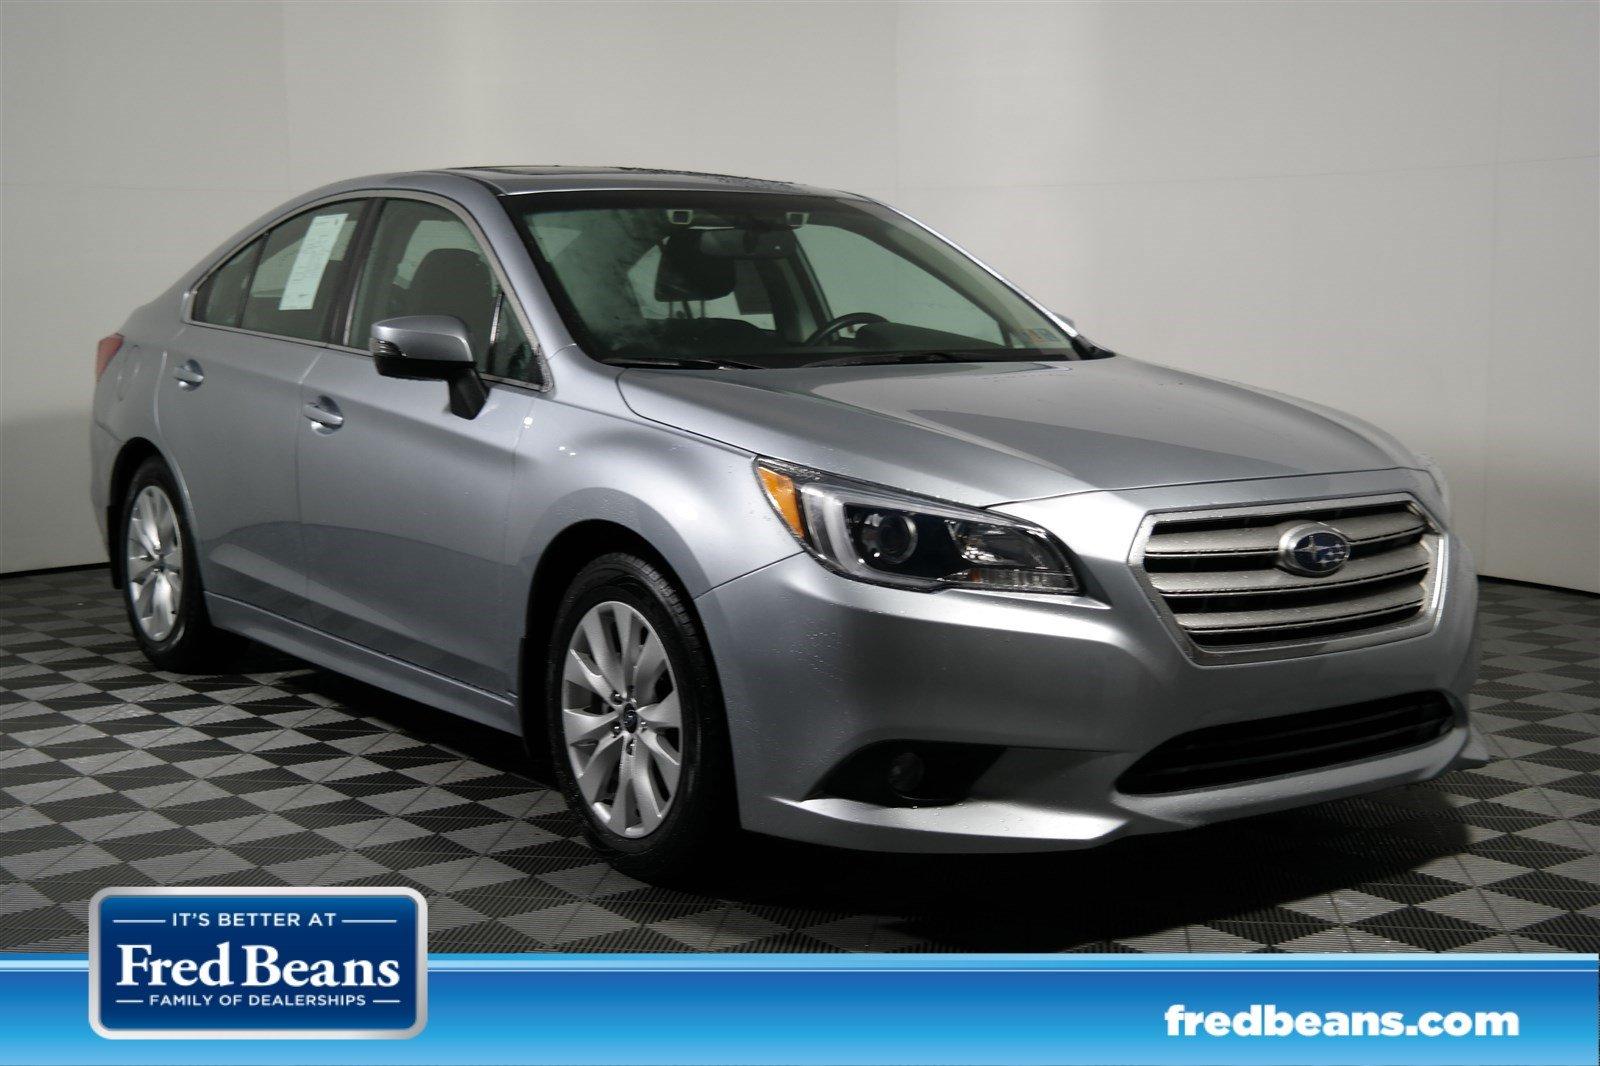 Photo Certified Used 2015 Subaru Legacy 2.5i Premium For Sale in Doylestown PA - Serving Allentown, Jenkintown  Sellersville  4S3BNAH65F3048688